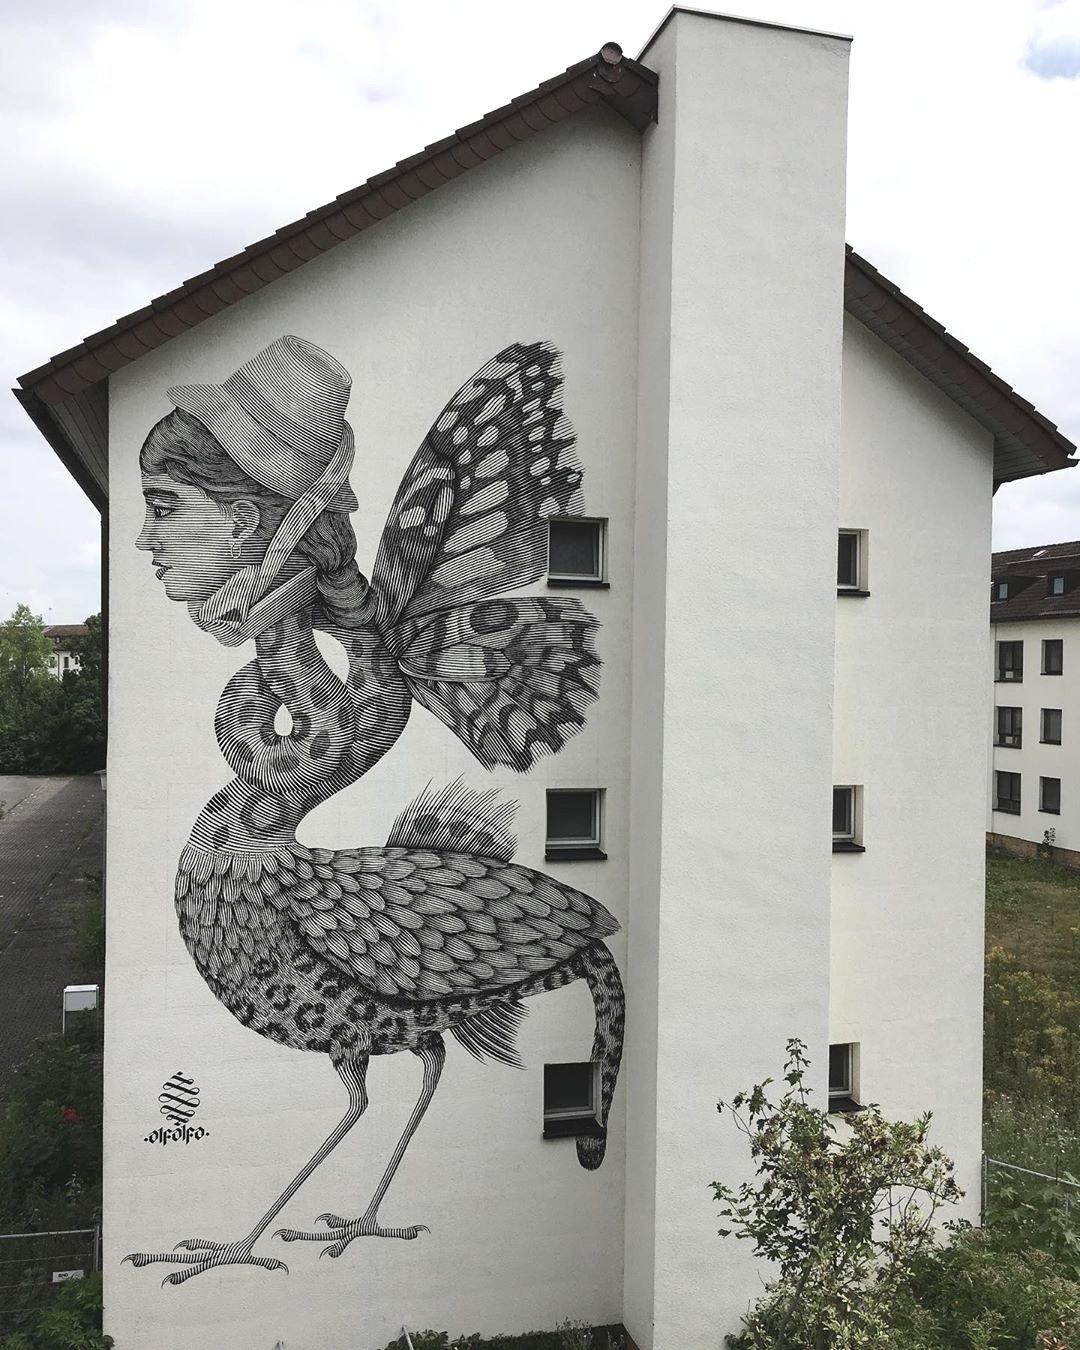 Nicolas Alfalfa @Heidelberg, Germany